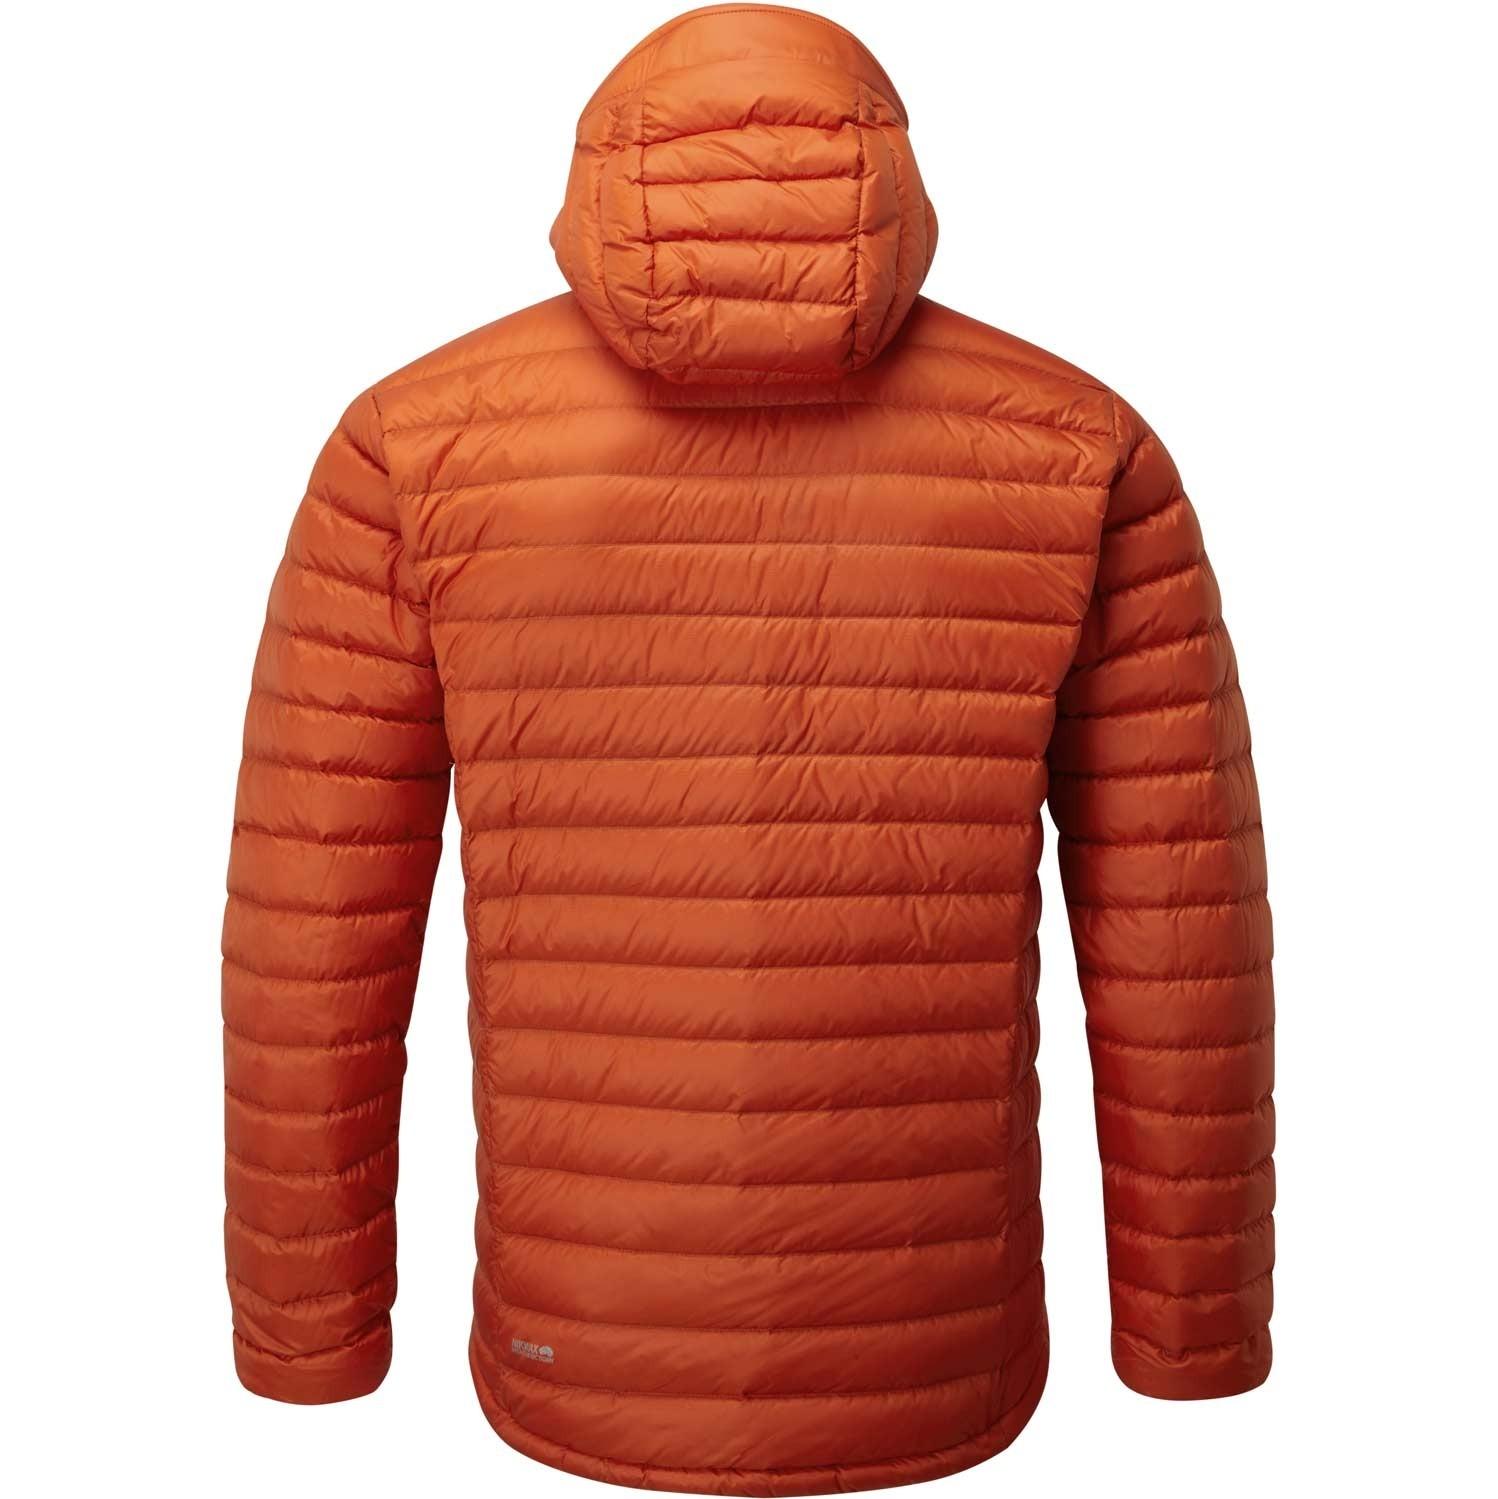 Microlight Alpine Down Jacket - Firecracker/Red Clay